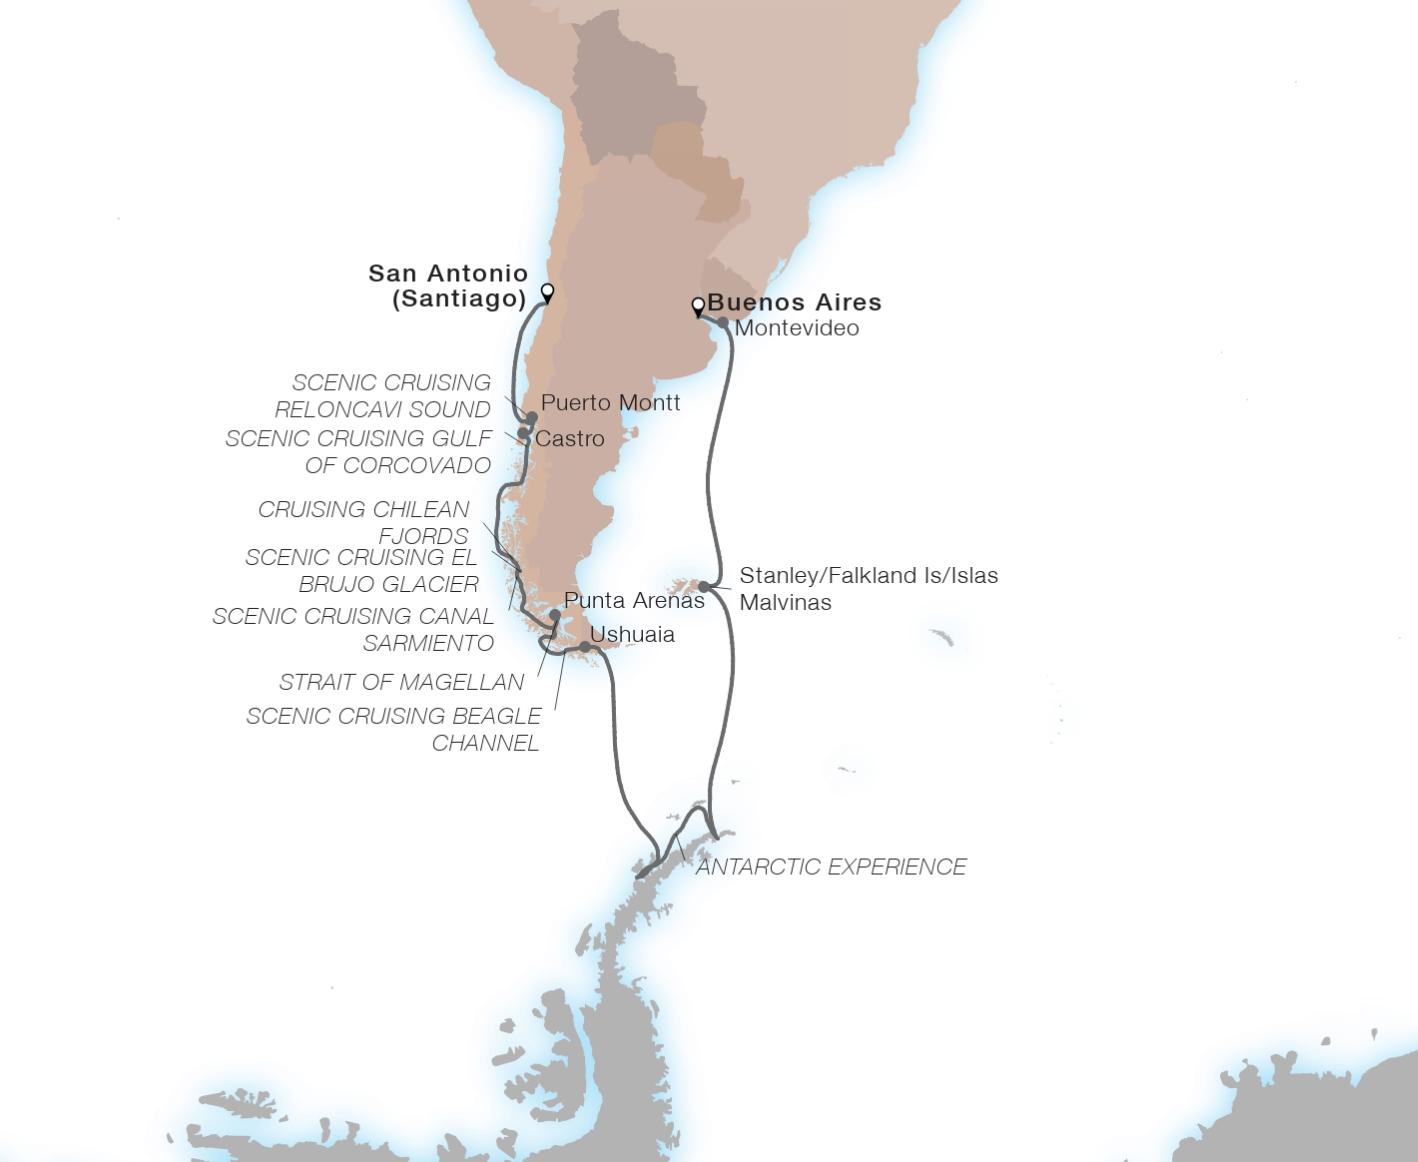 21-Day Ultimate Antarctica & Patagonia - SEABOURN QUESTSan Antonio (Santiago), Chile to Buenos Aires, Argentia